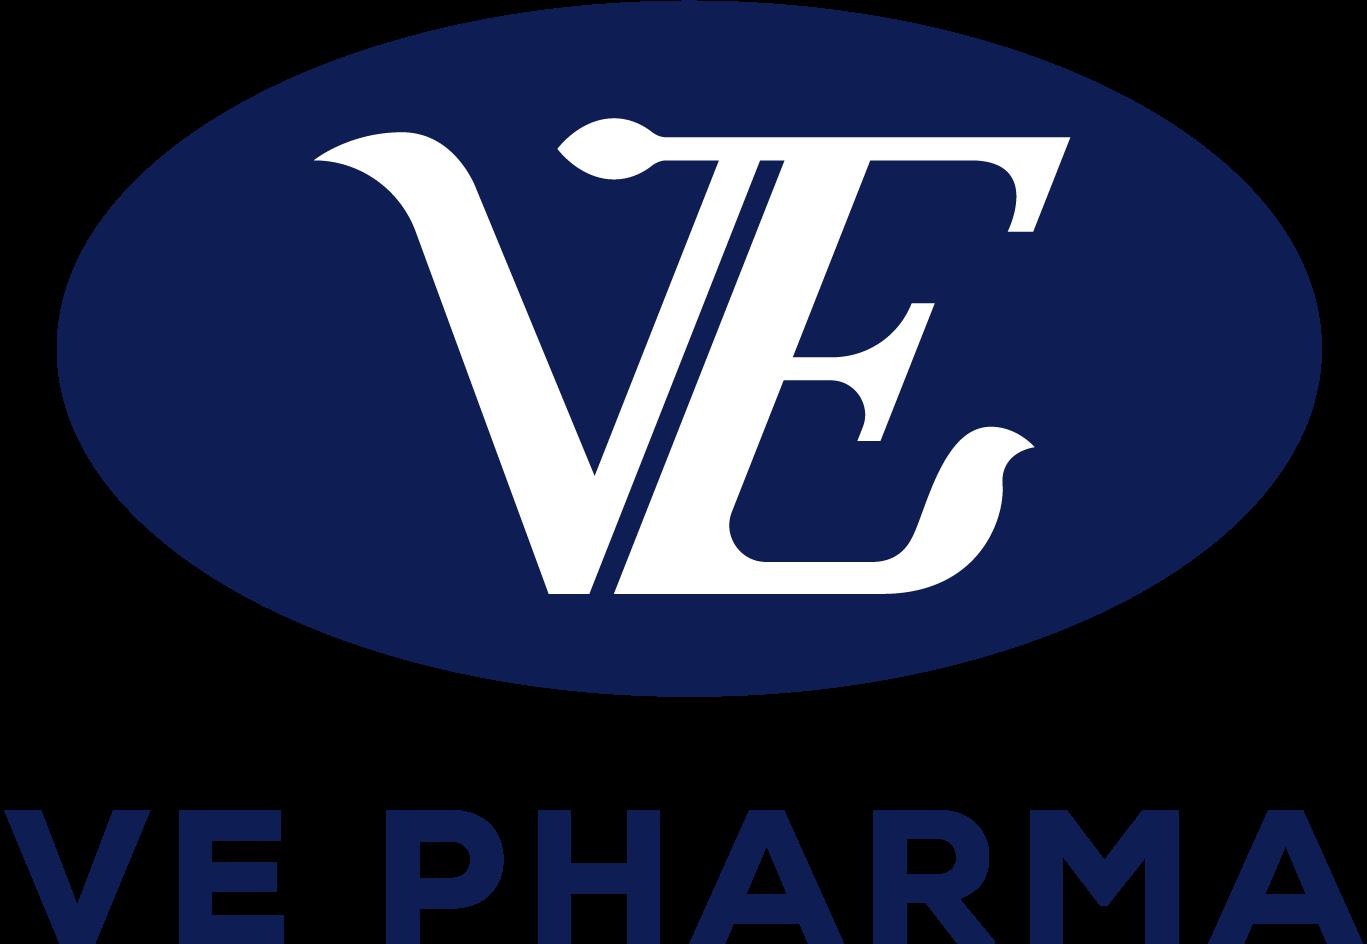 VE Pharma